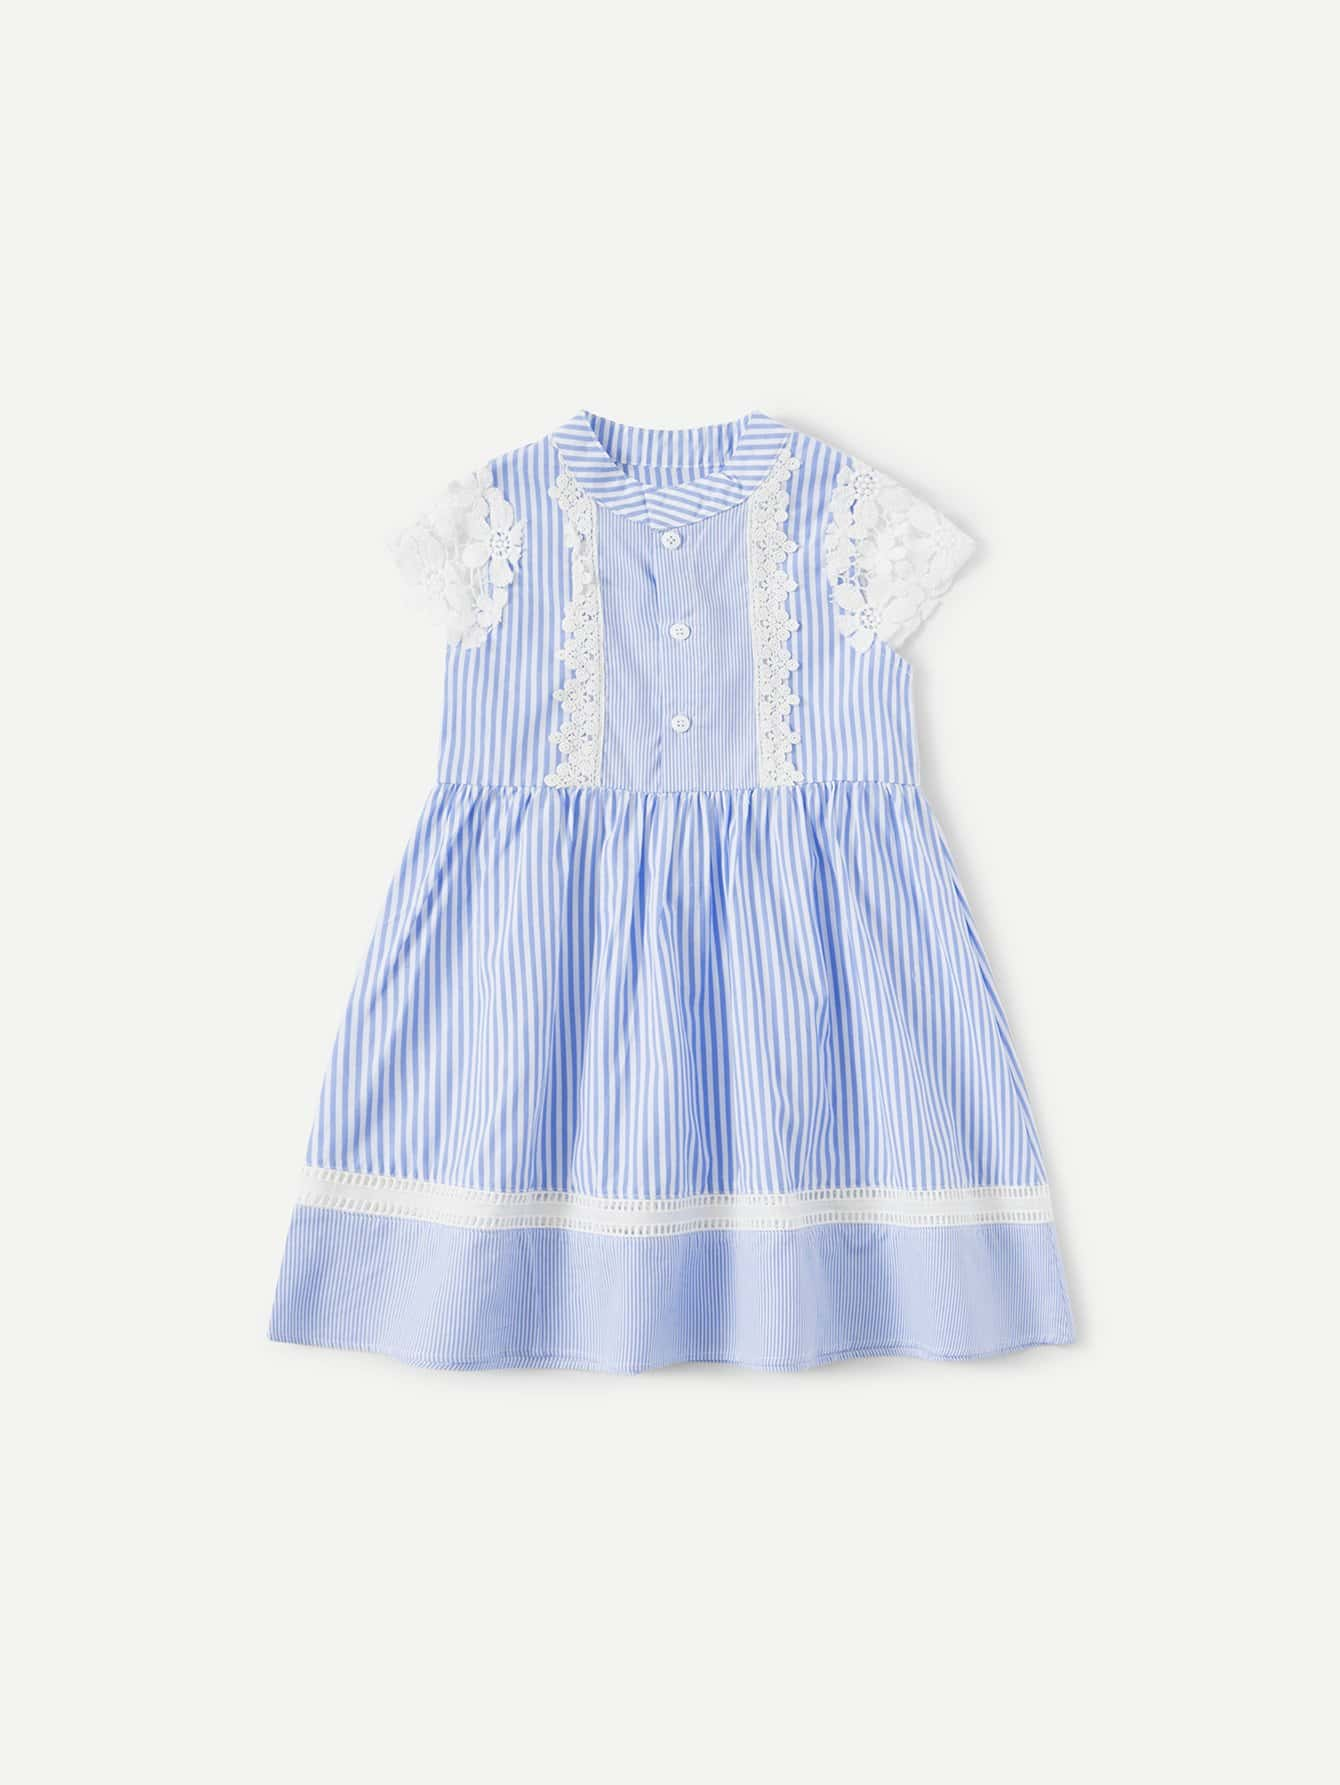 Kids Contrast Lace Striped Dress contrast lace striped star print dress